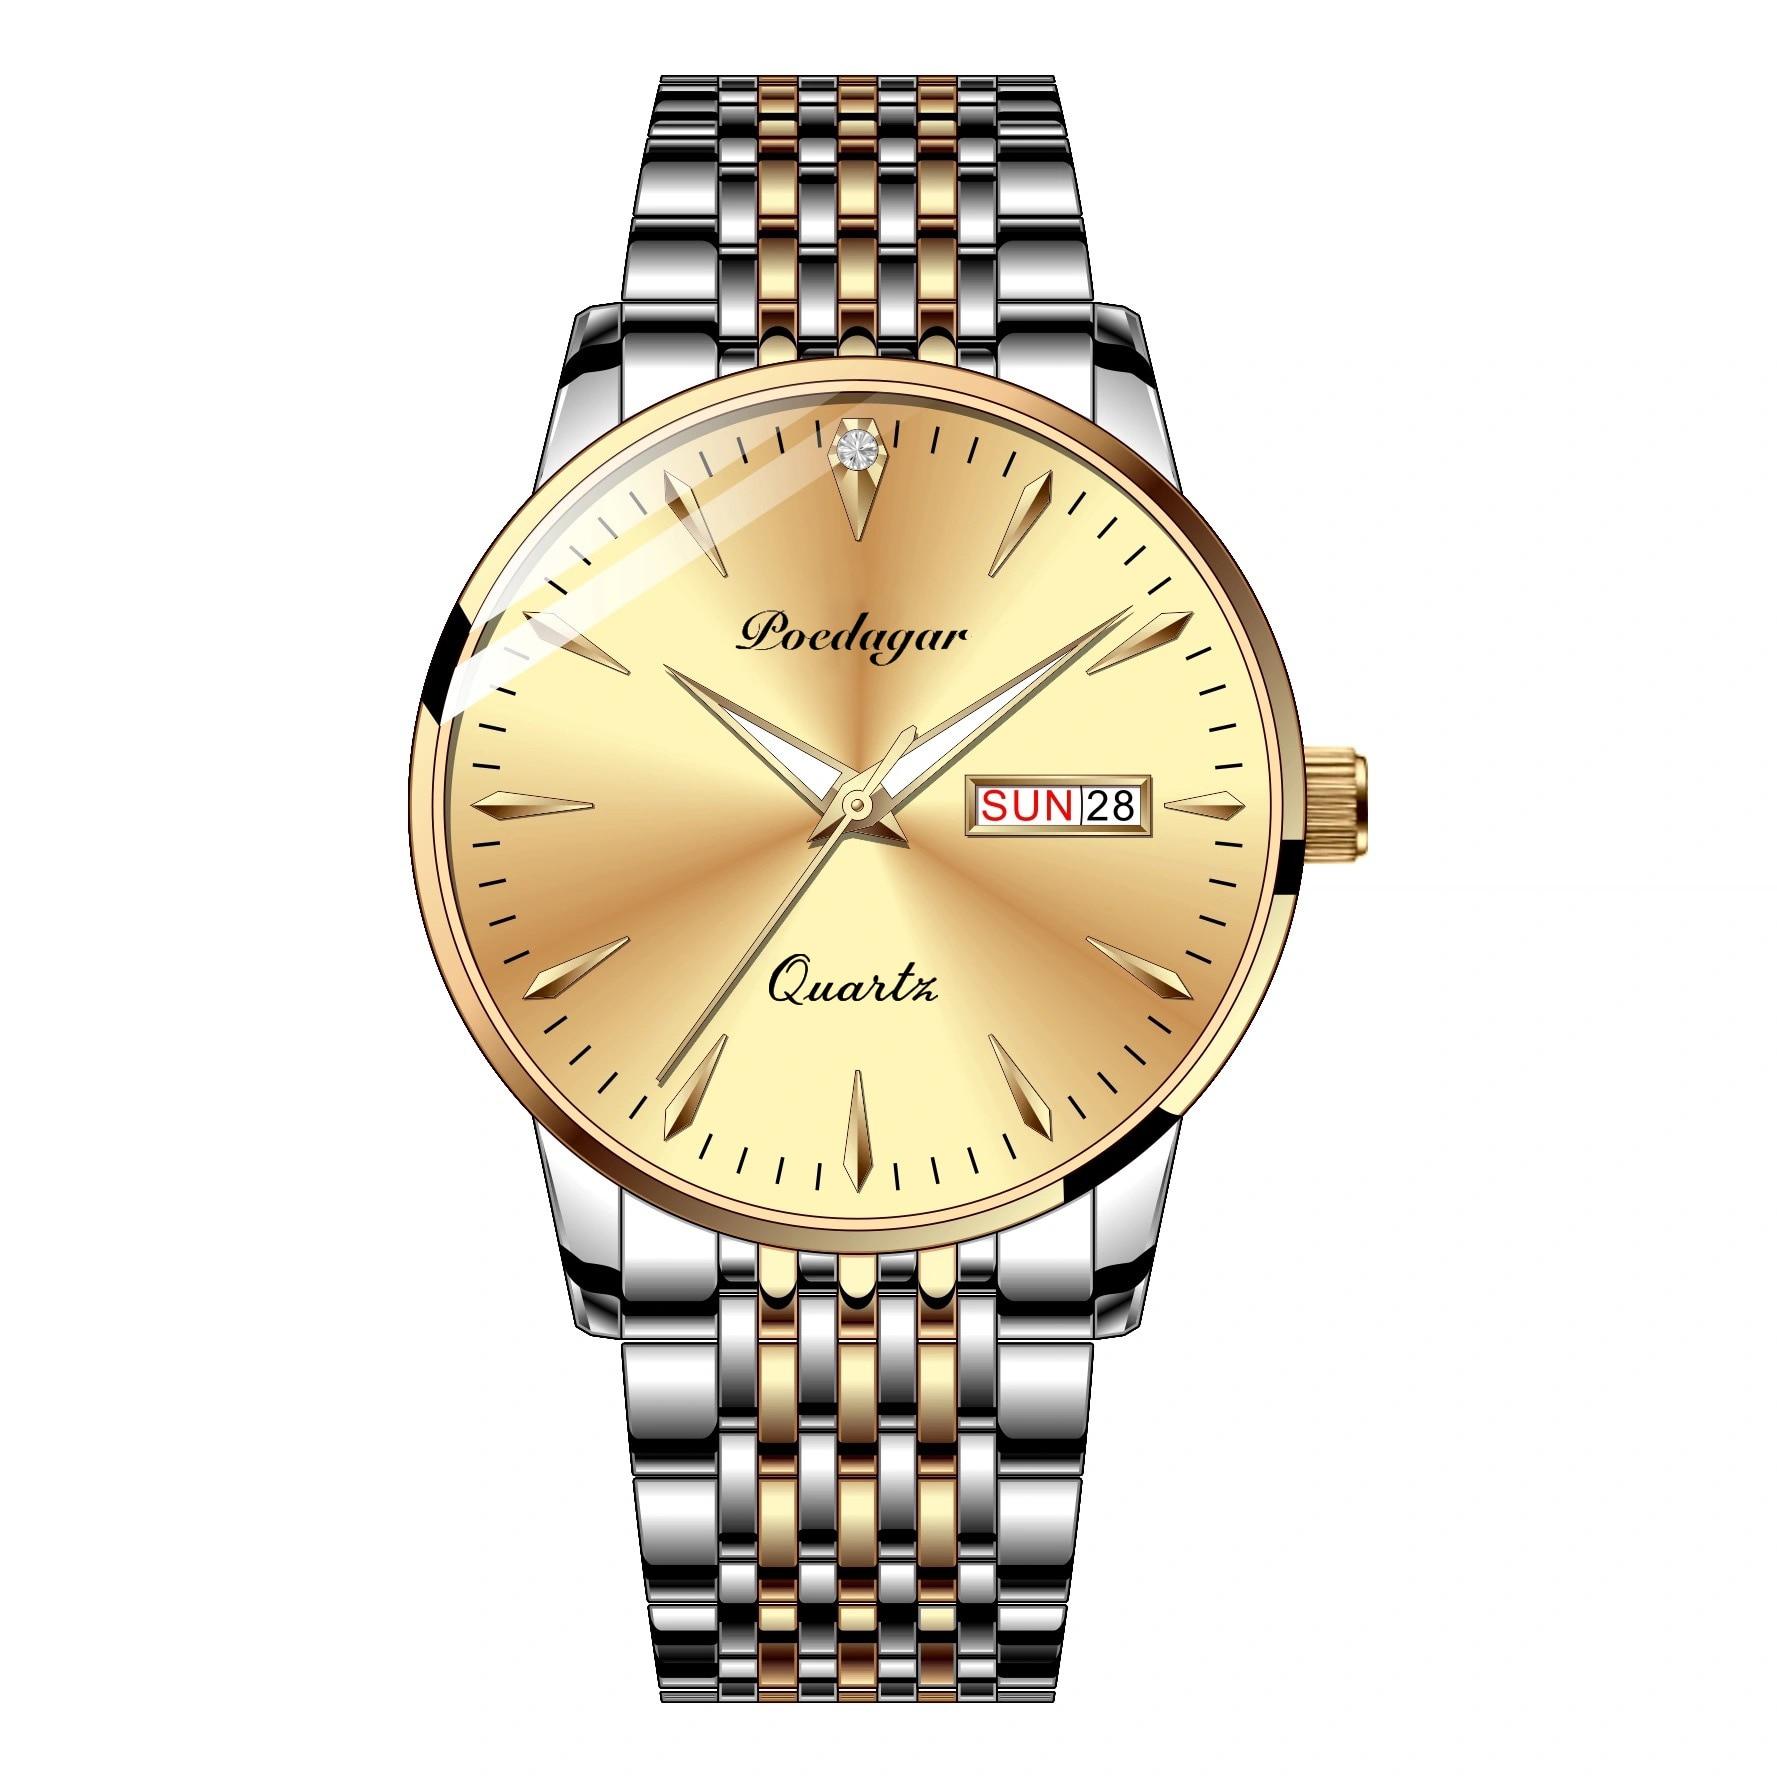 POEDAGAR Top Brand Luxury Mens Watch 50m Waterproof Date Clock Male Sports Watches Men Quartz Wrist for Man